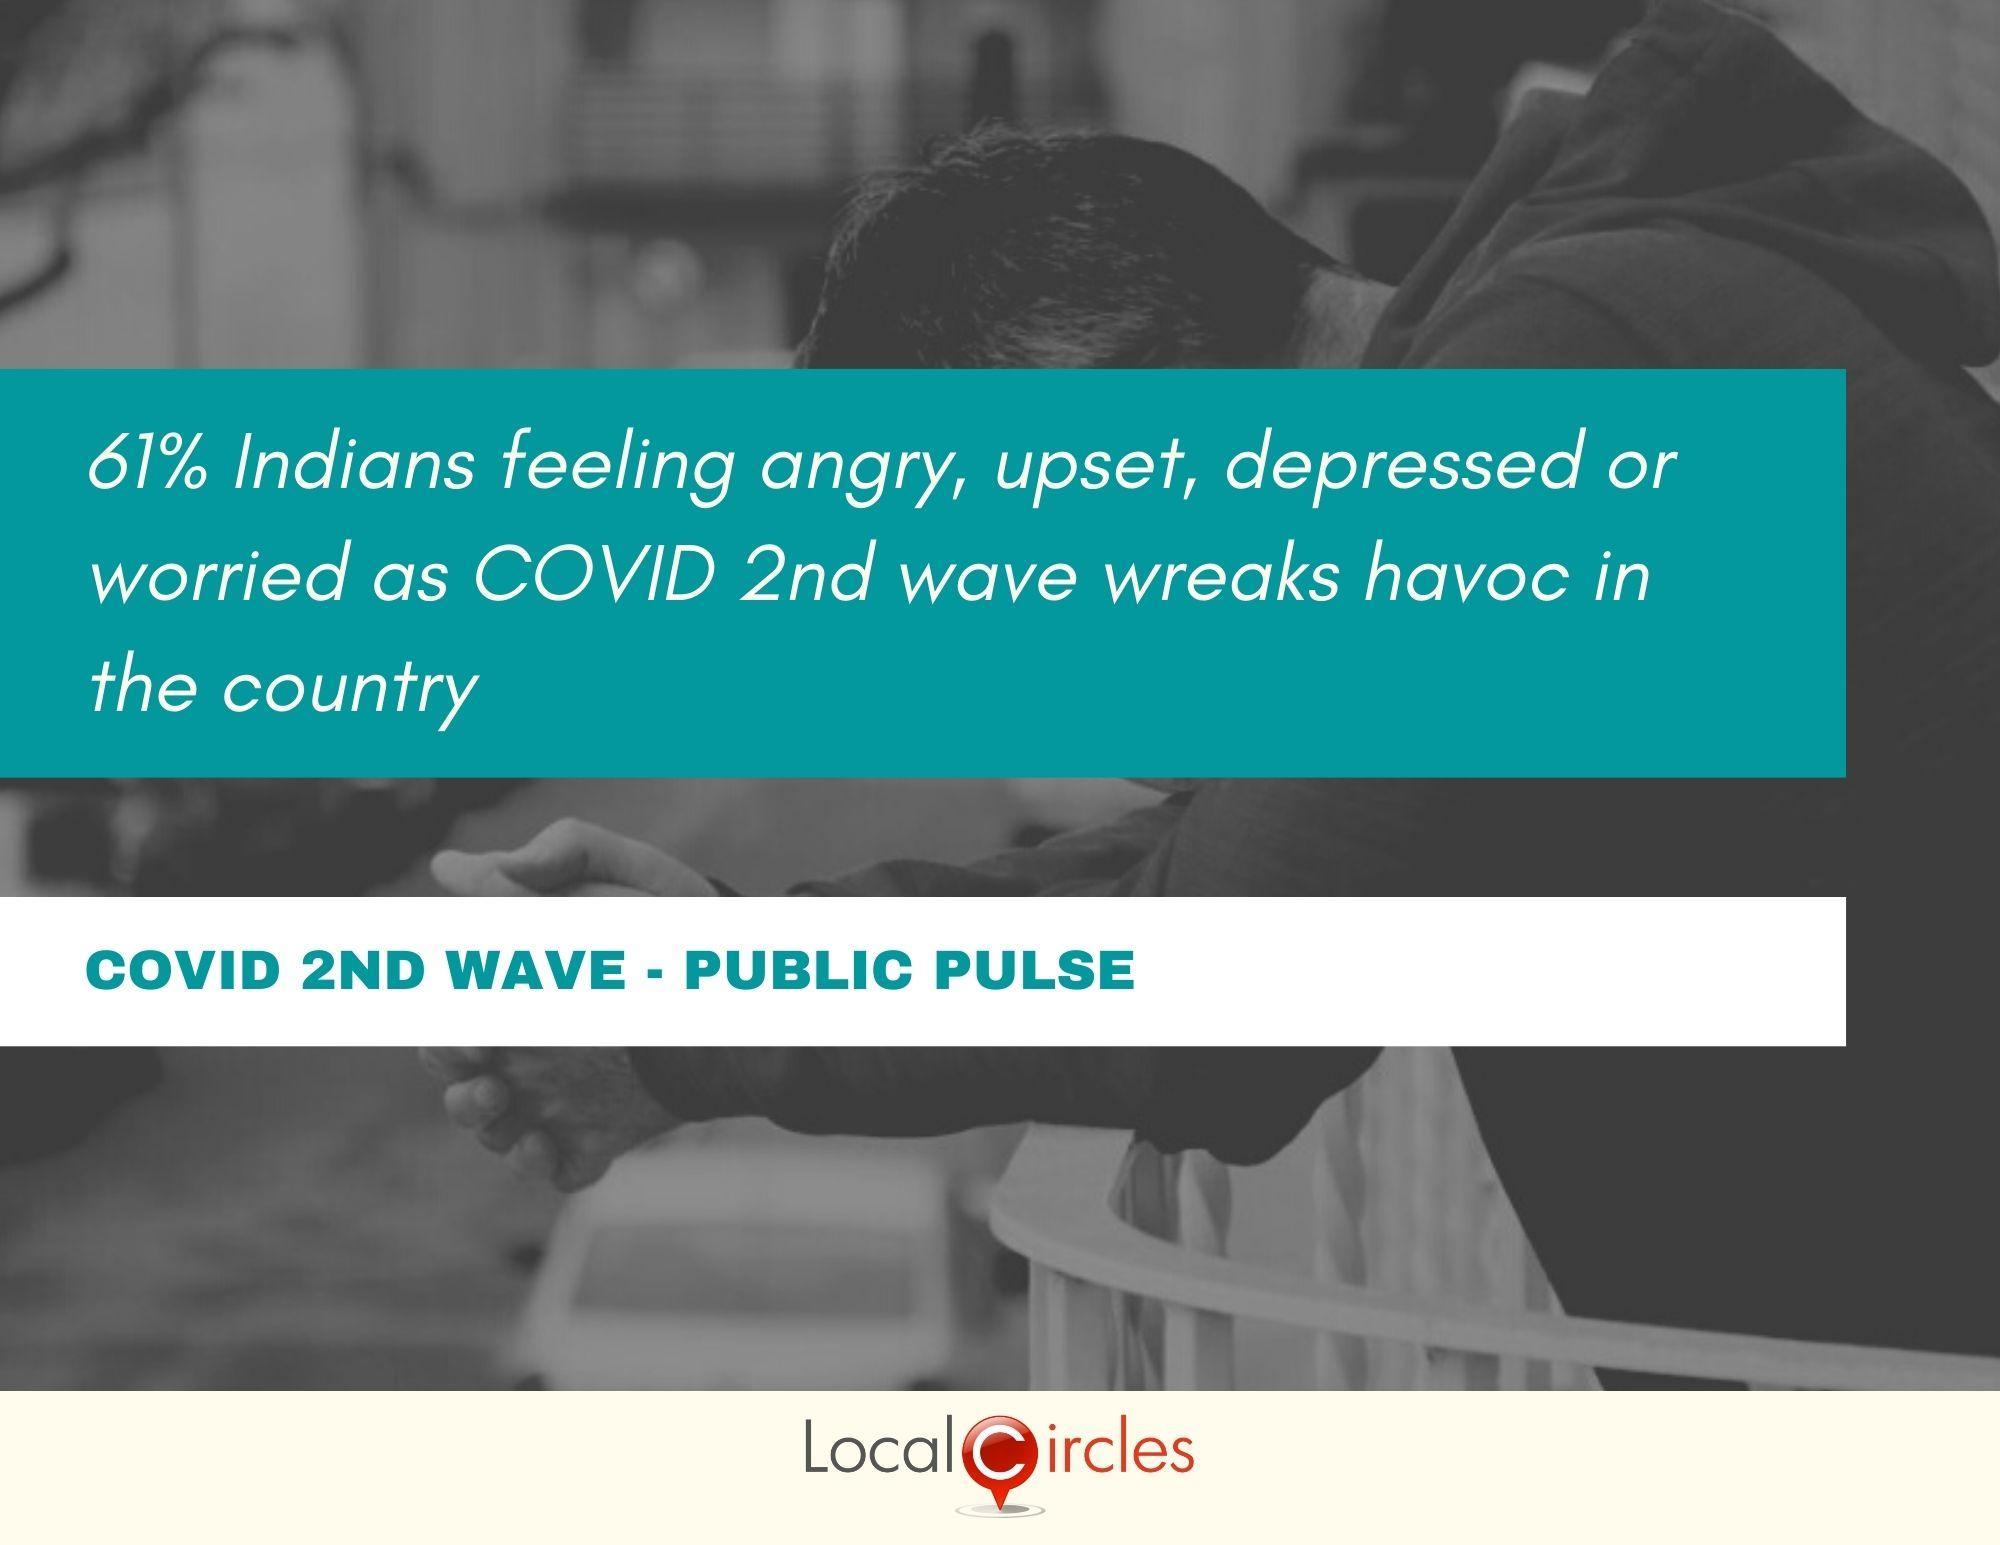 via_LocalCircles_COVID_2nd_Wave_-_Public_Pulse_1___20210505032740___.jpg